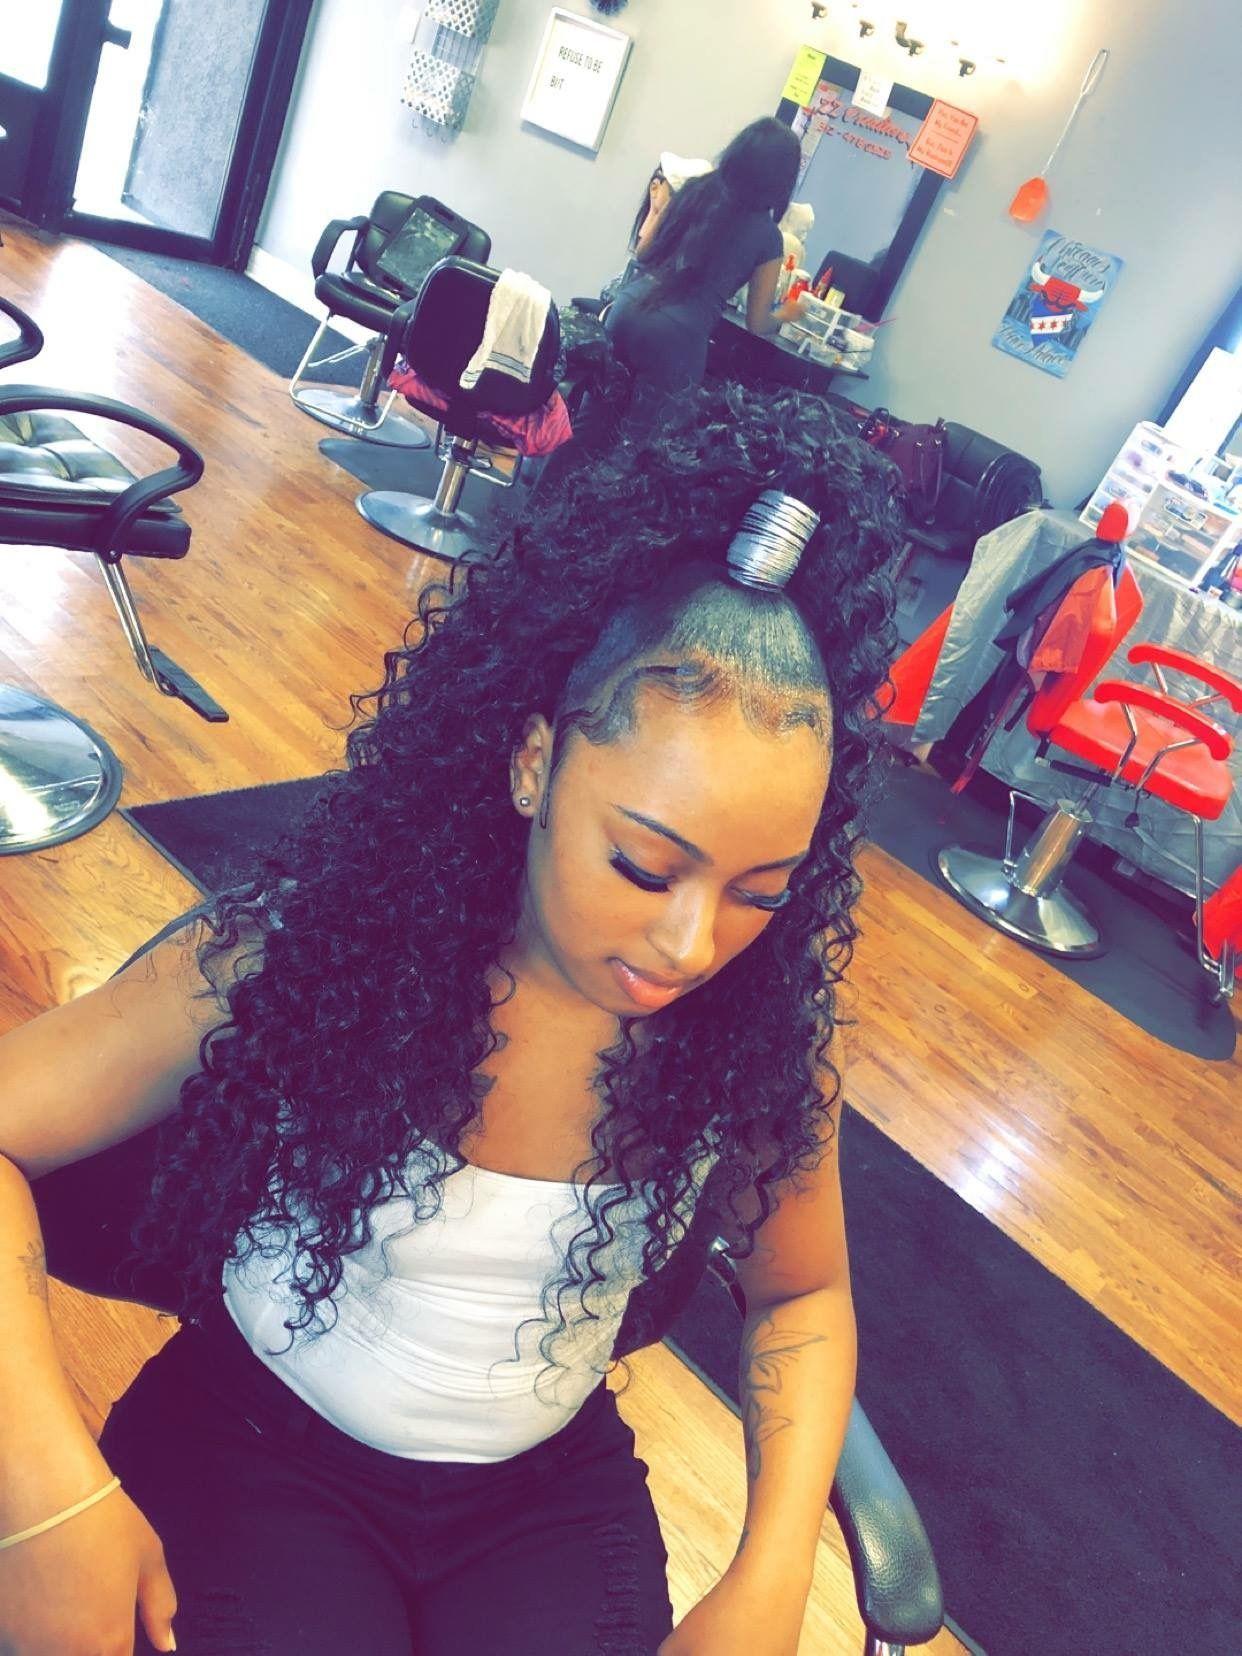 10 Hair Brushes For Procreate Hair Ponytail Styles High Ponytail Hairstyles Hair Styles